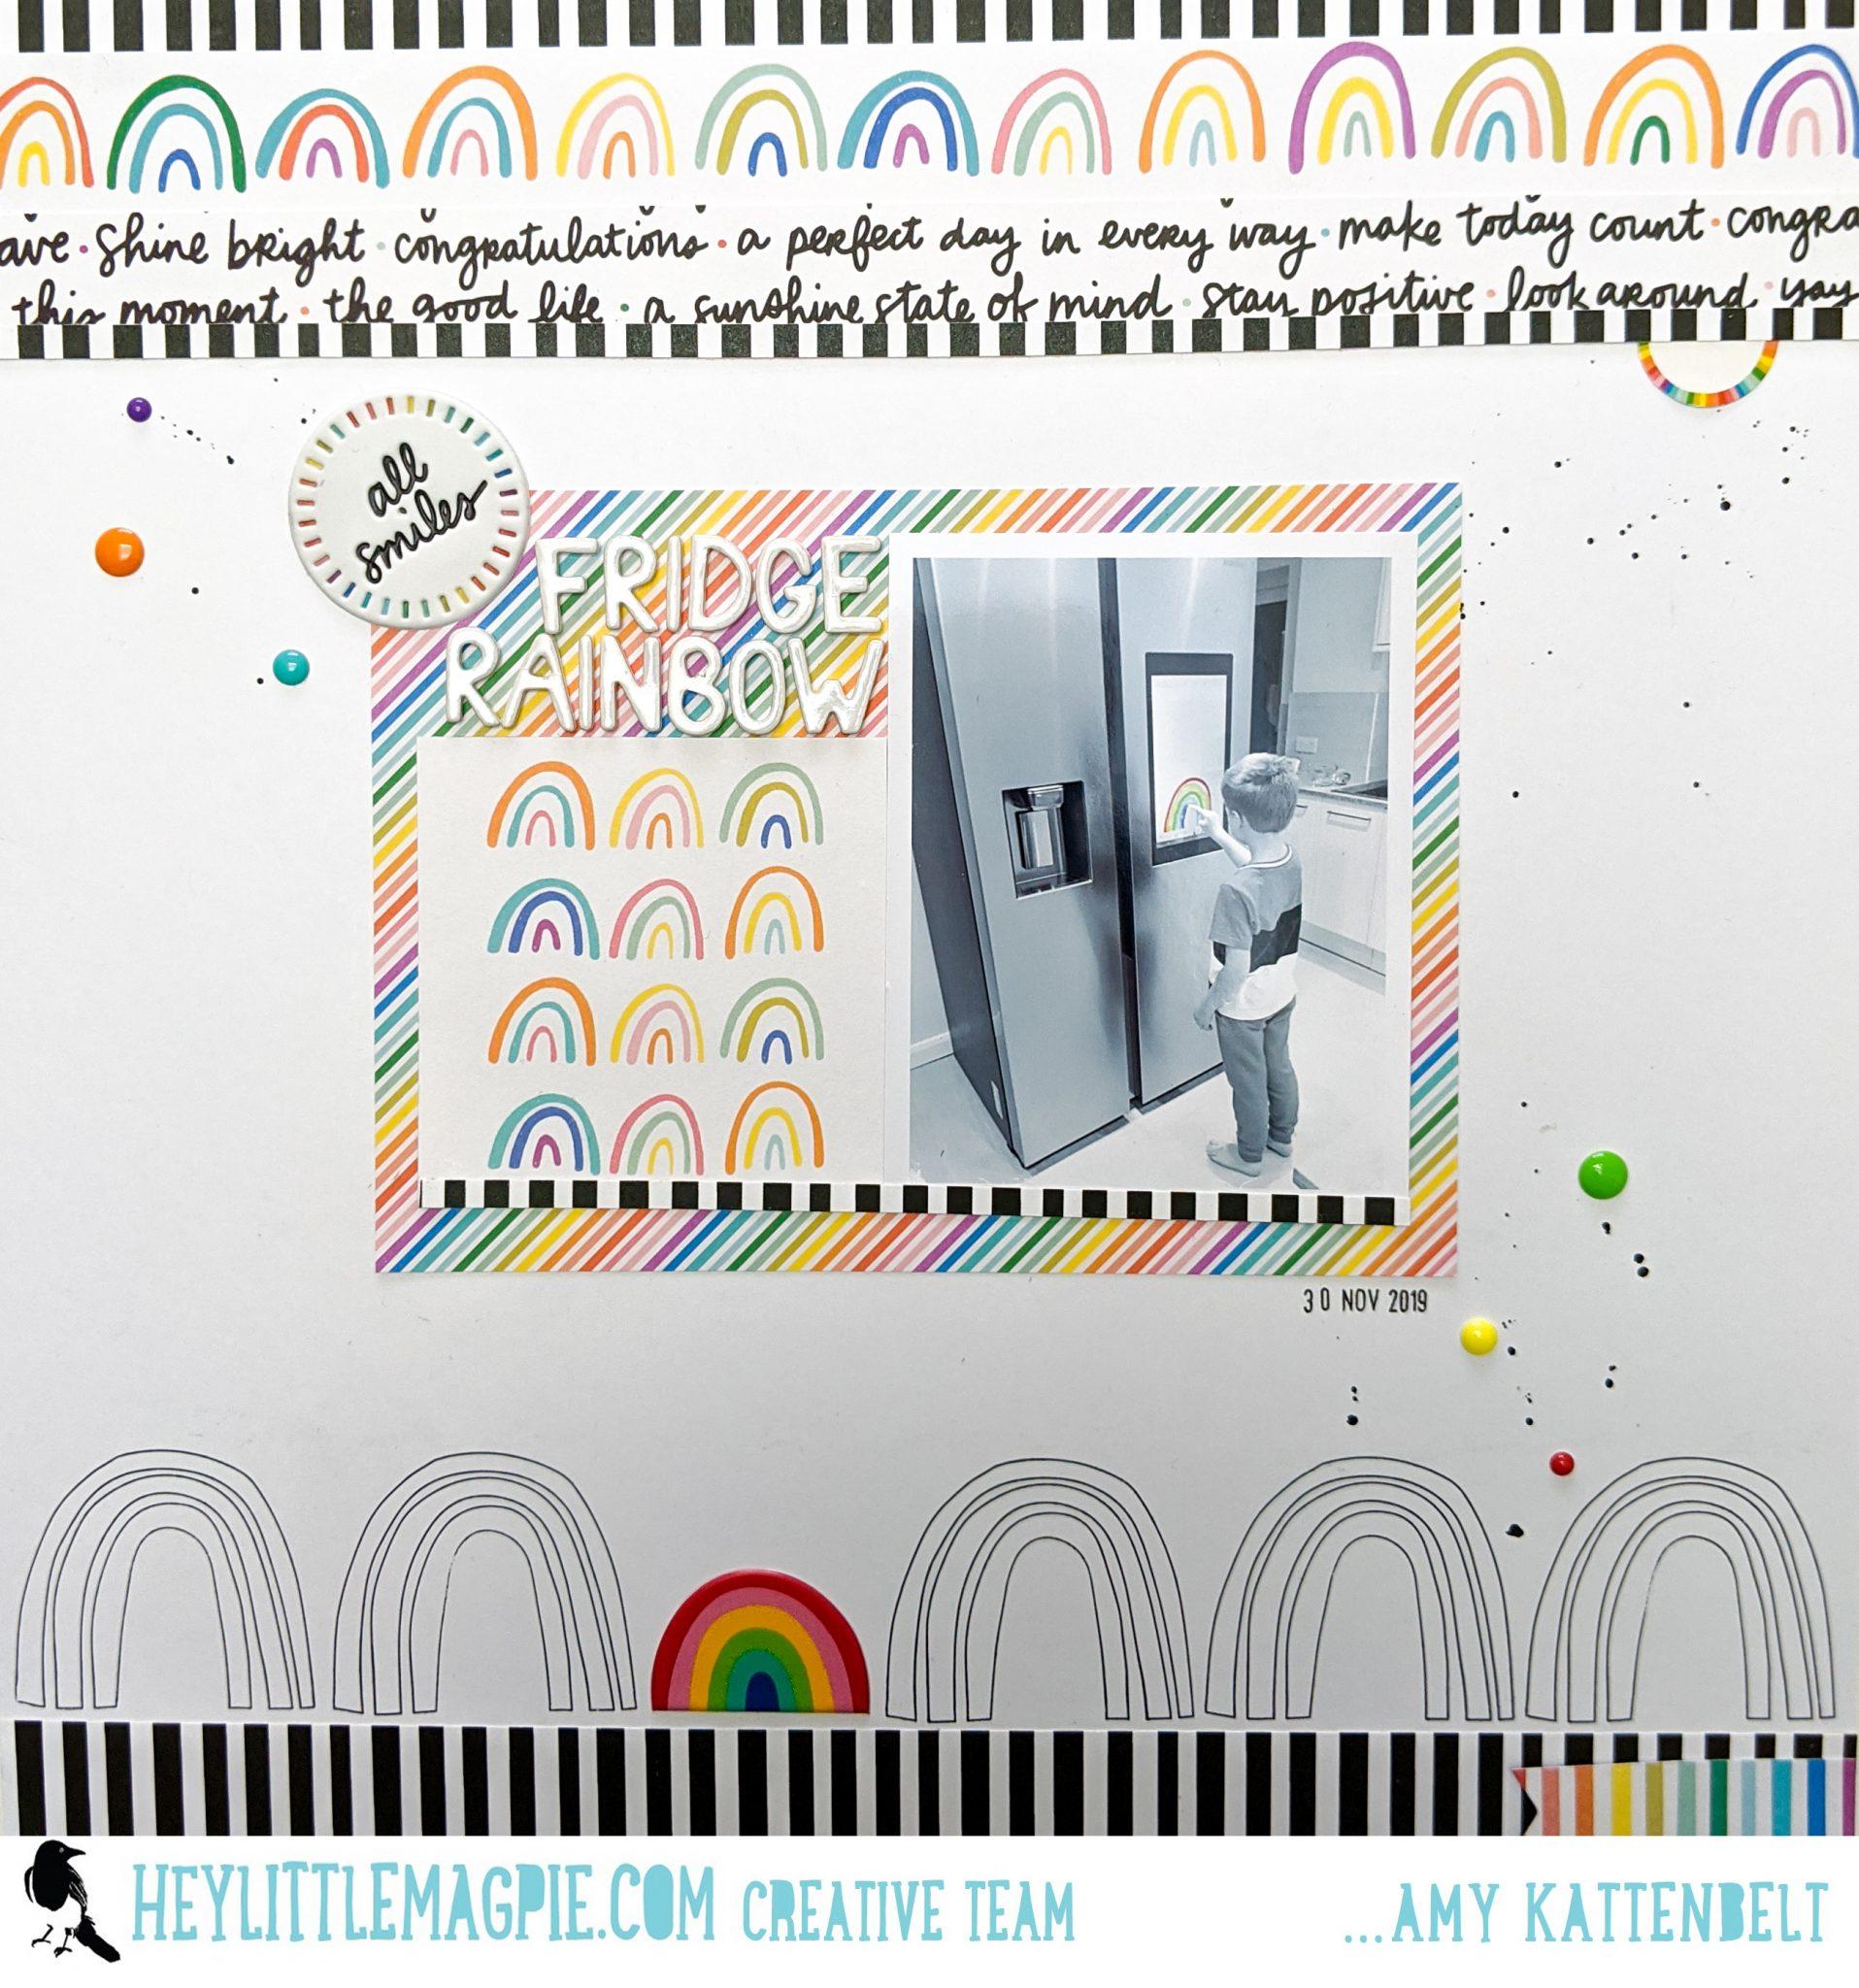 Fridge Rainbow   Picnic In The Park – Amy Tangerine   Amy Kattenbelt